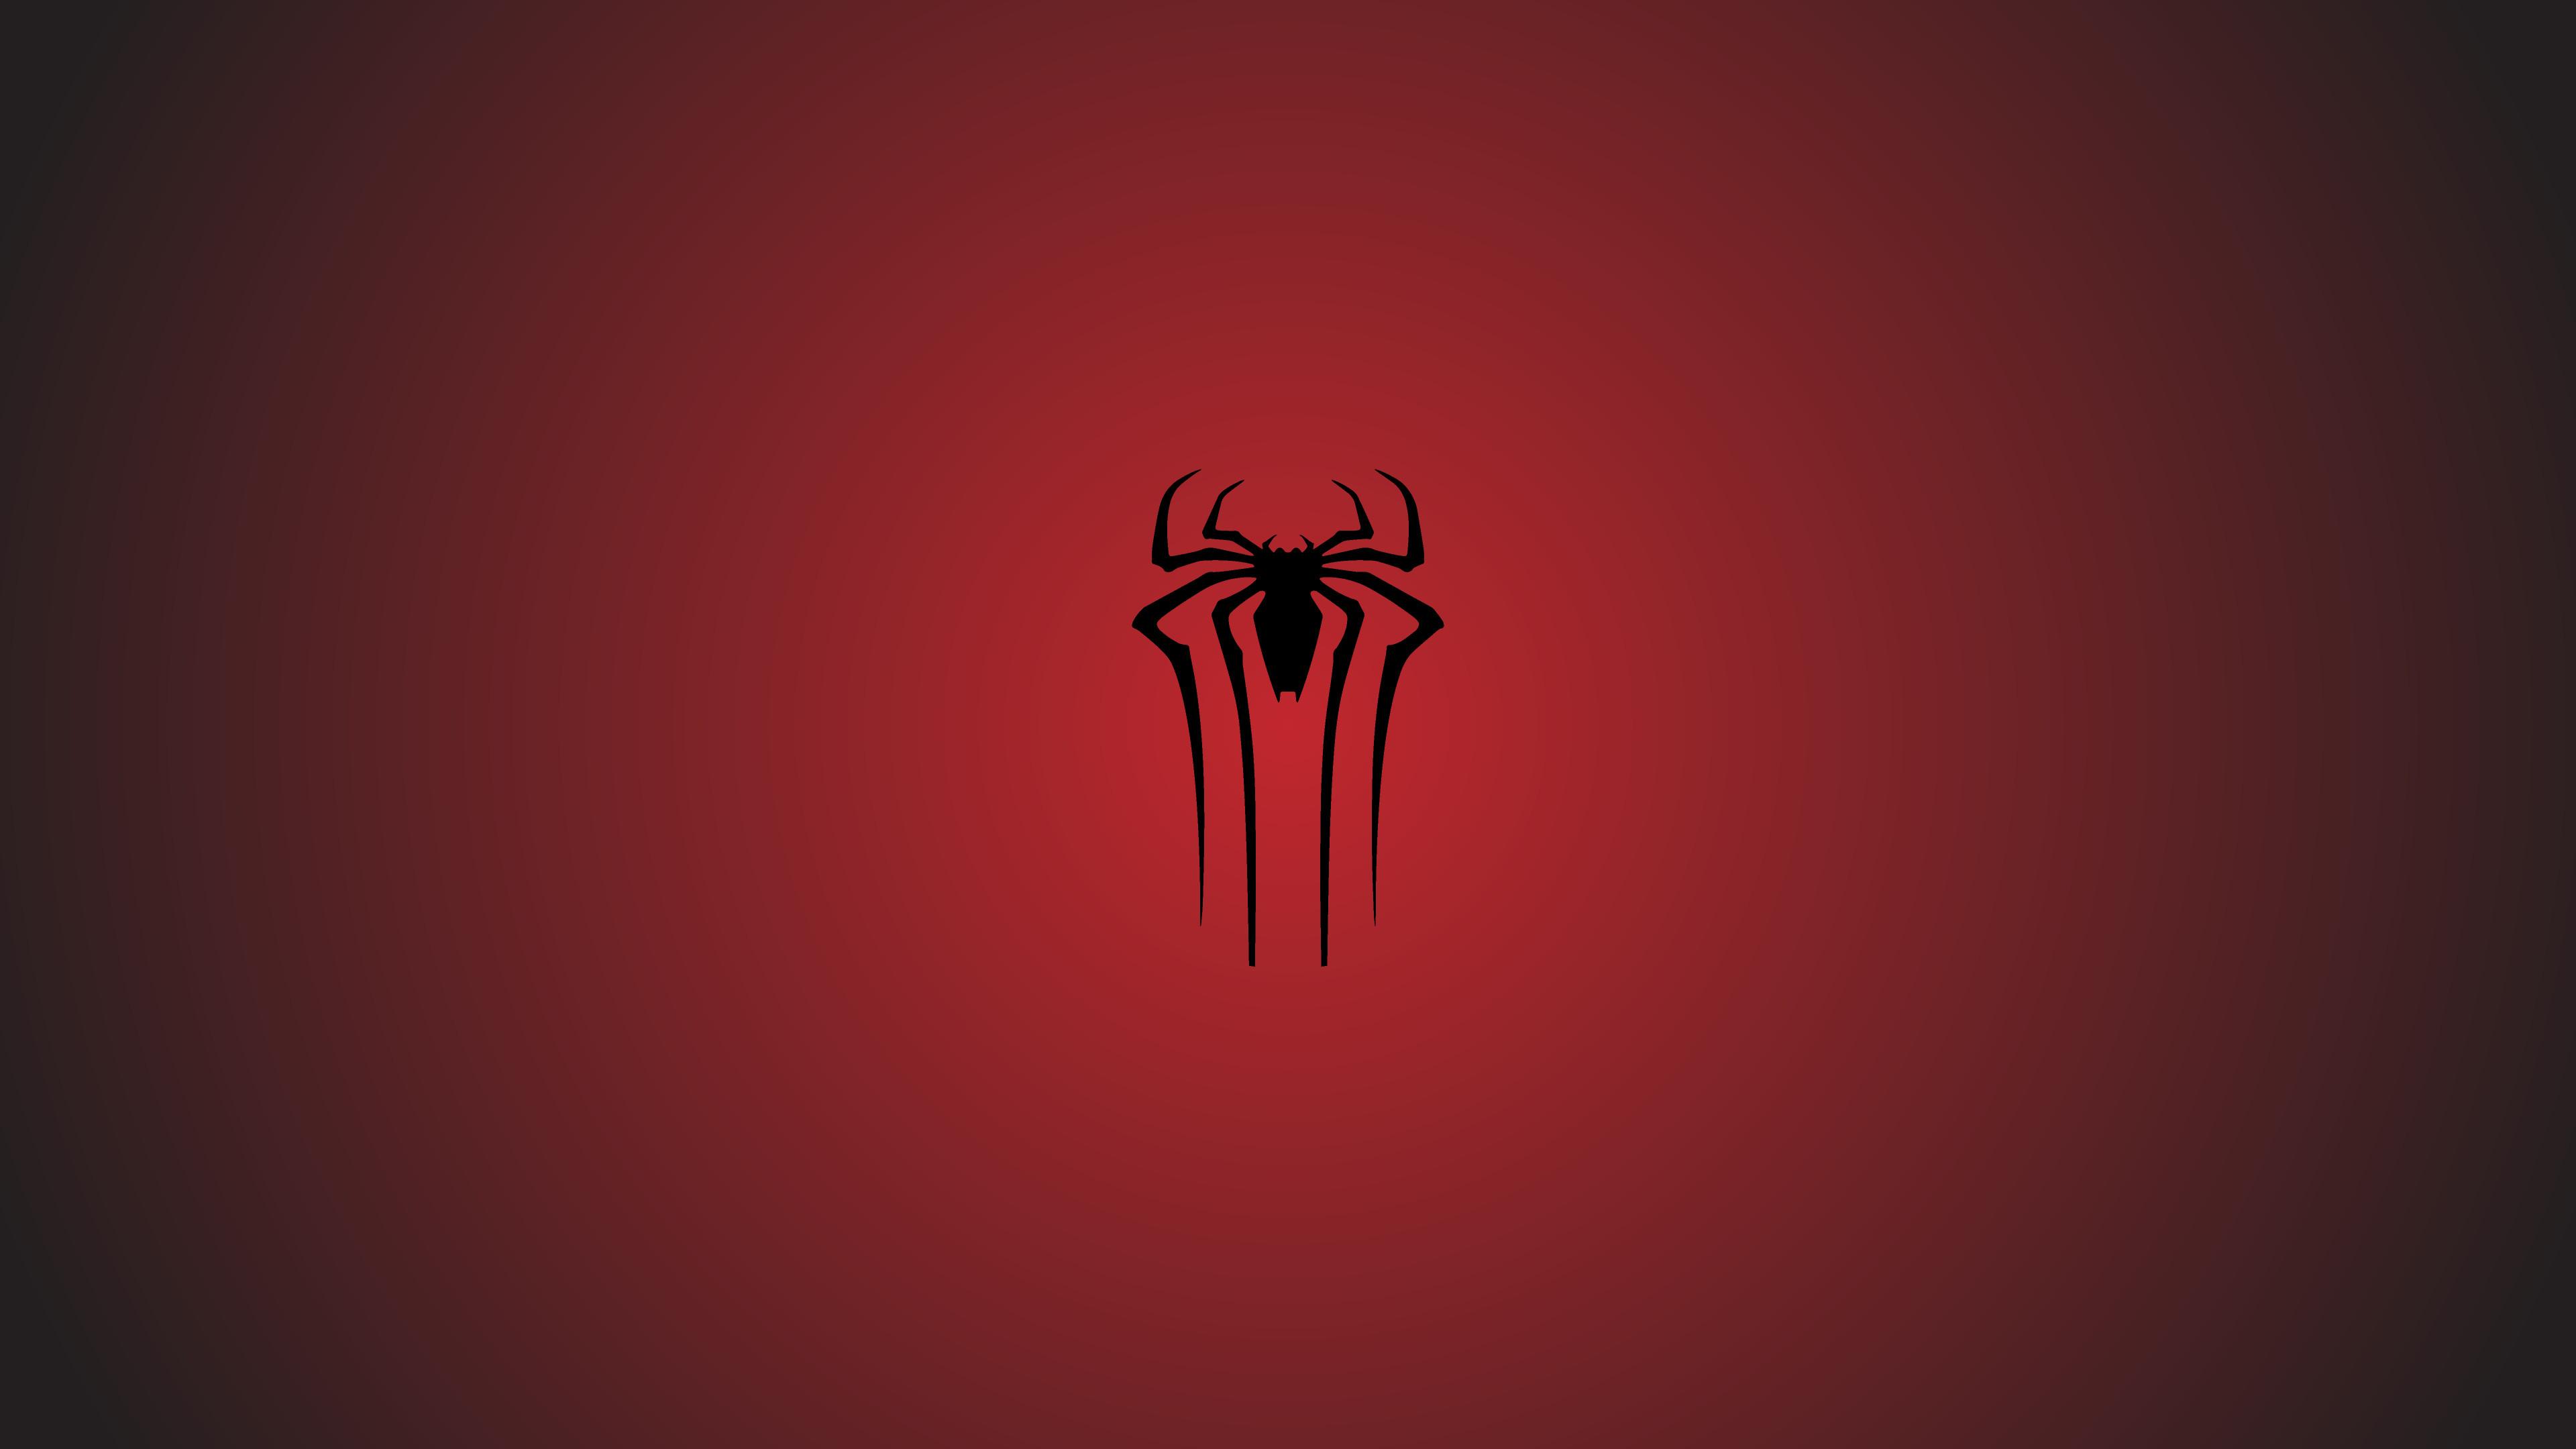 Minimal Spiderman Wallpapers 71 Images